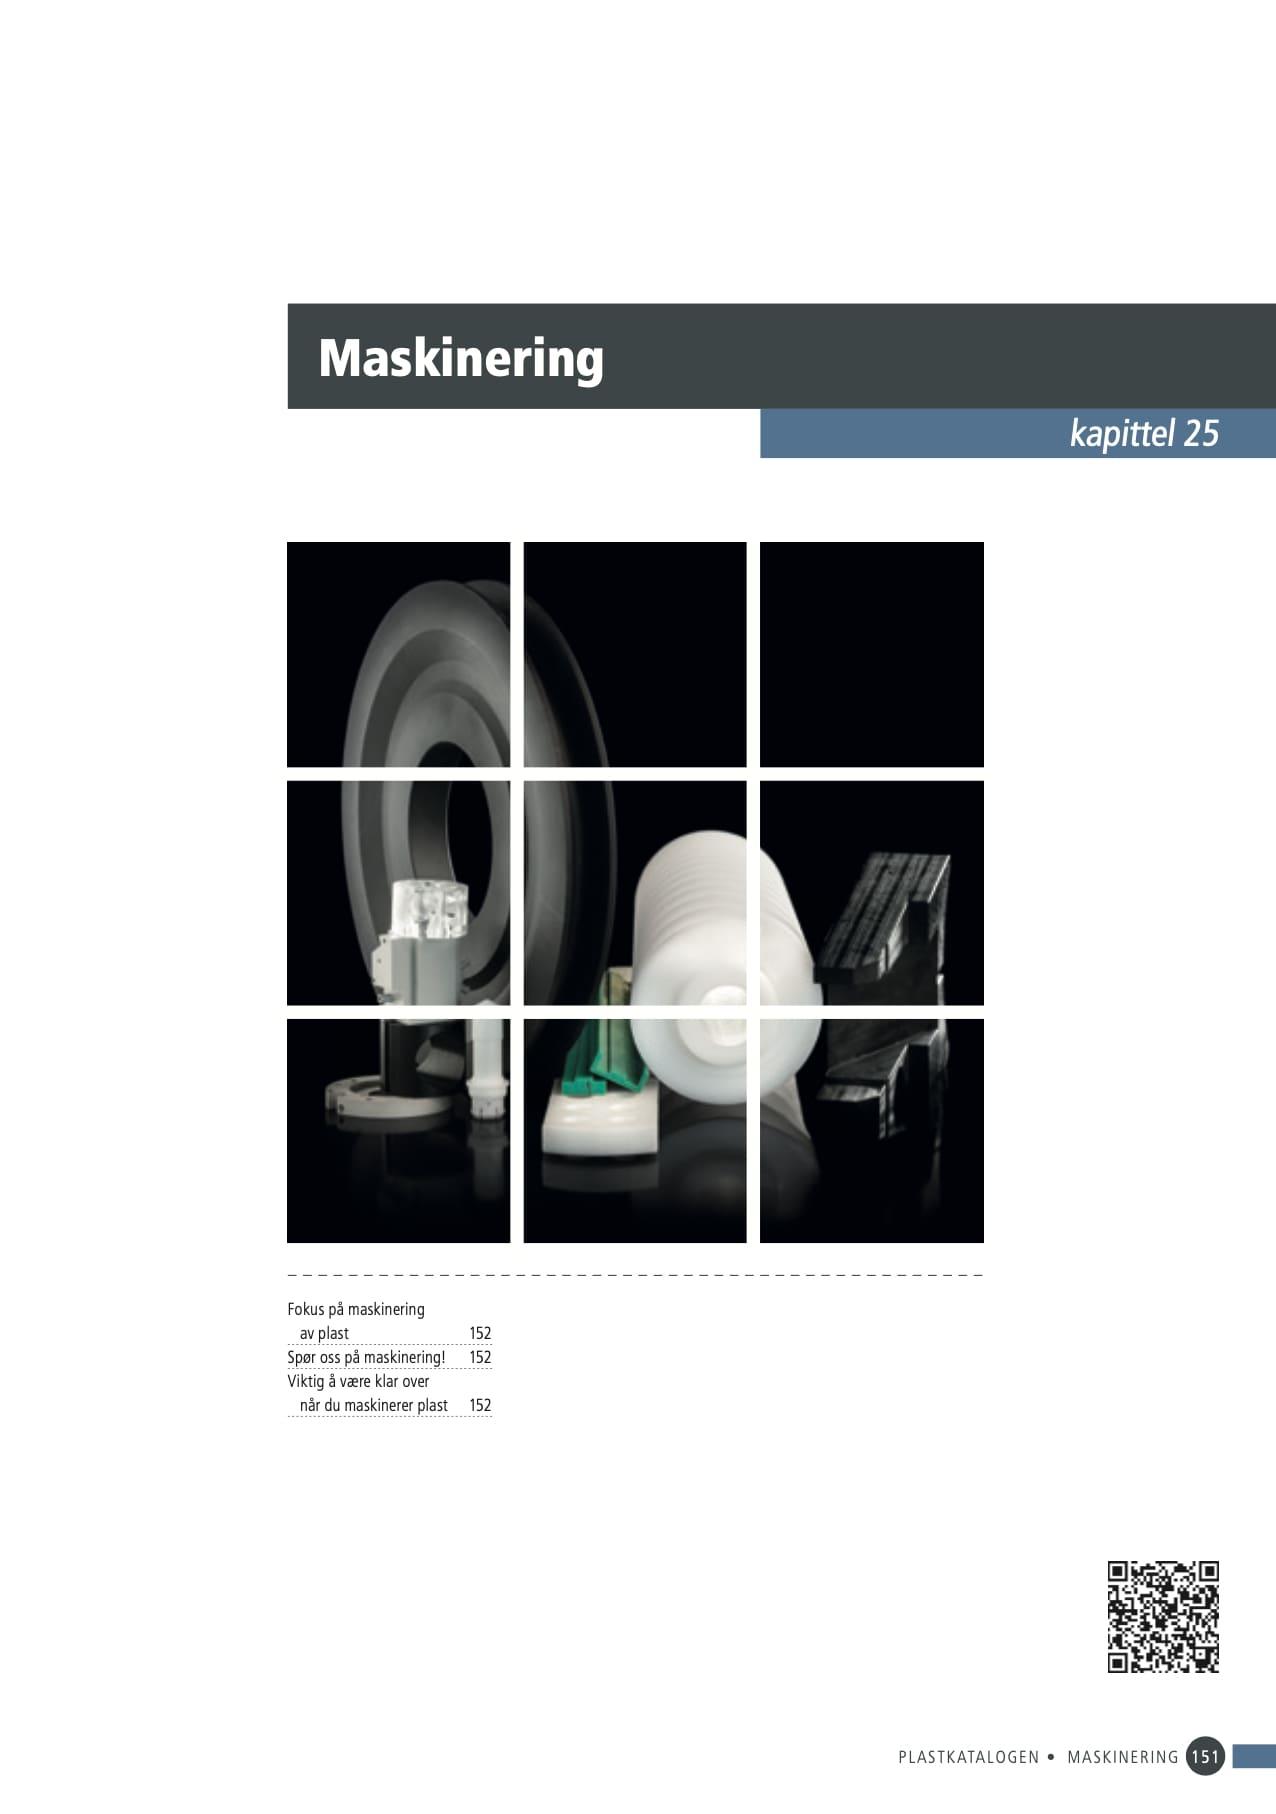 25. Maskinering